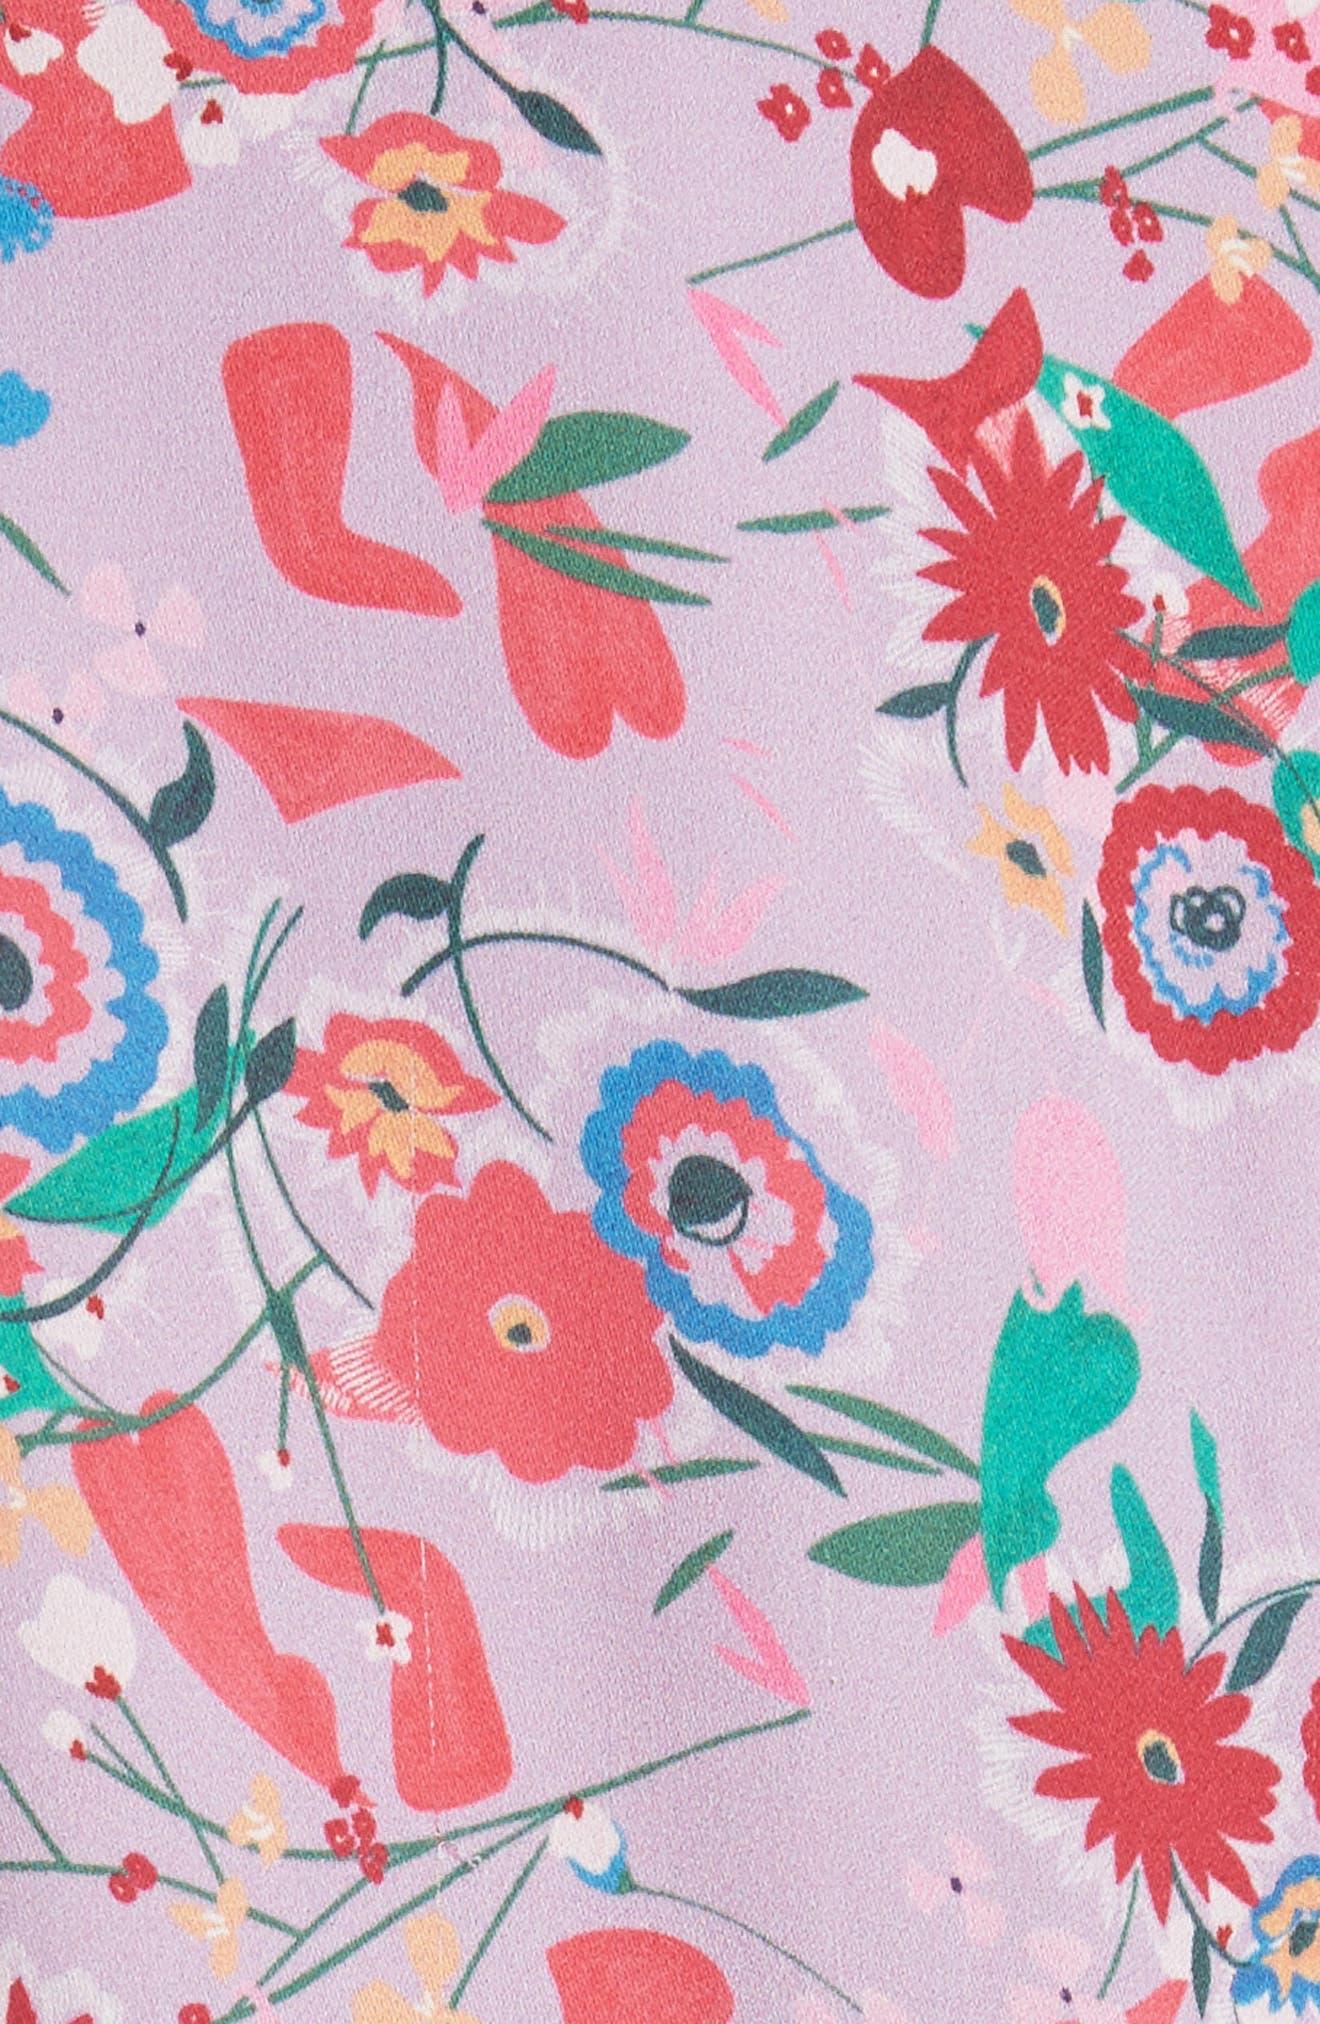 Eve Floral Print Dress,                             Alternate thumbnail 5, color,                             Lilac Pimpernel